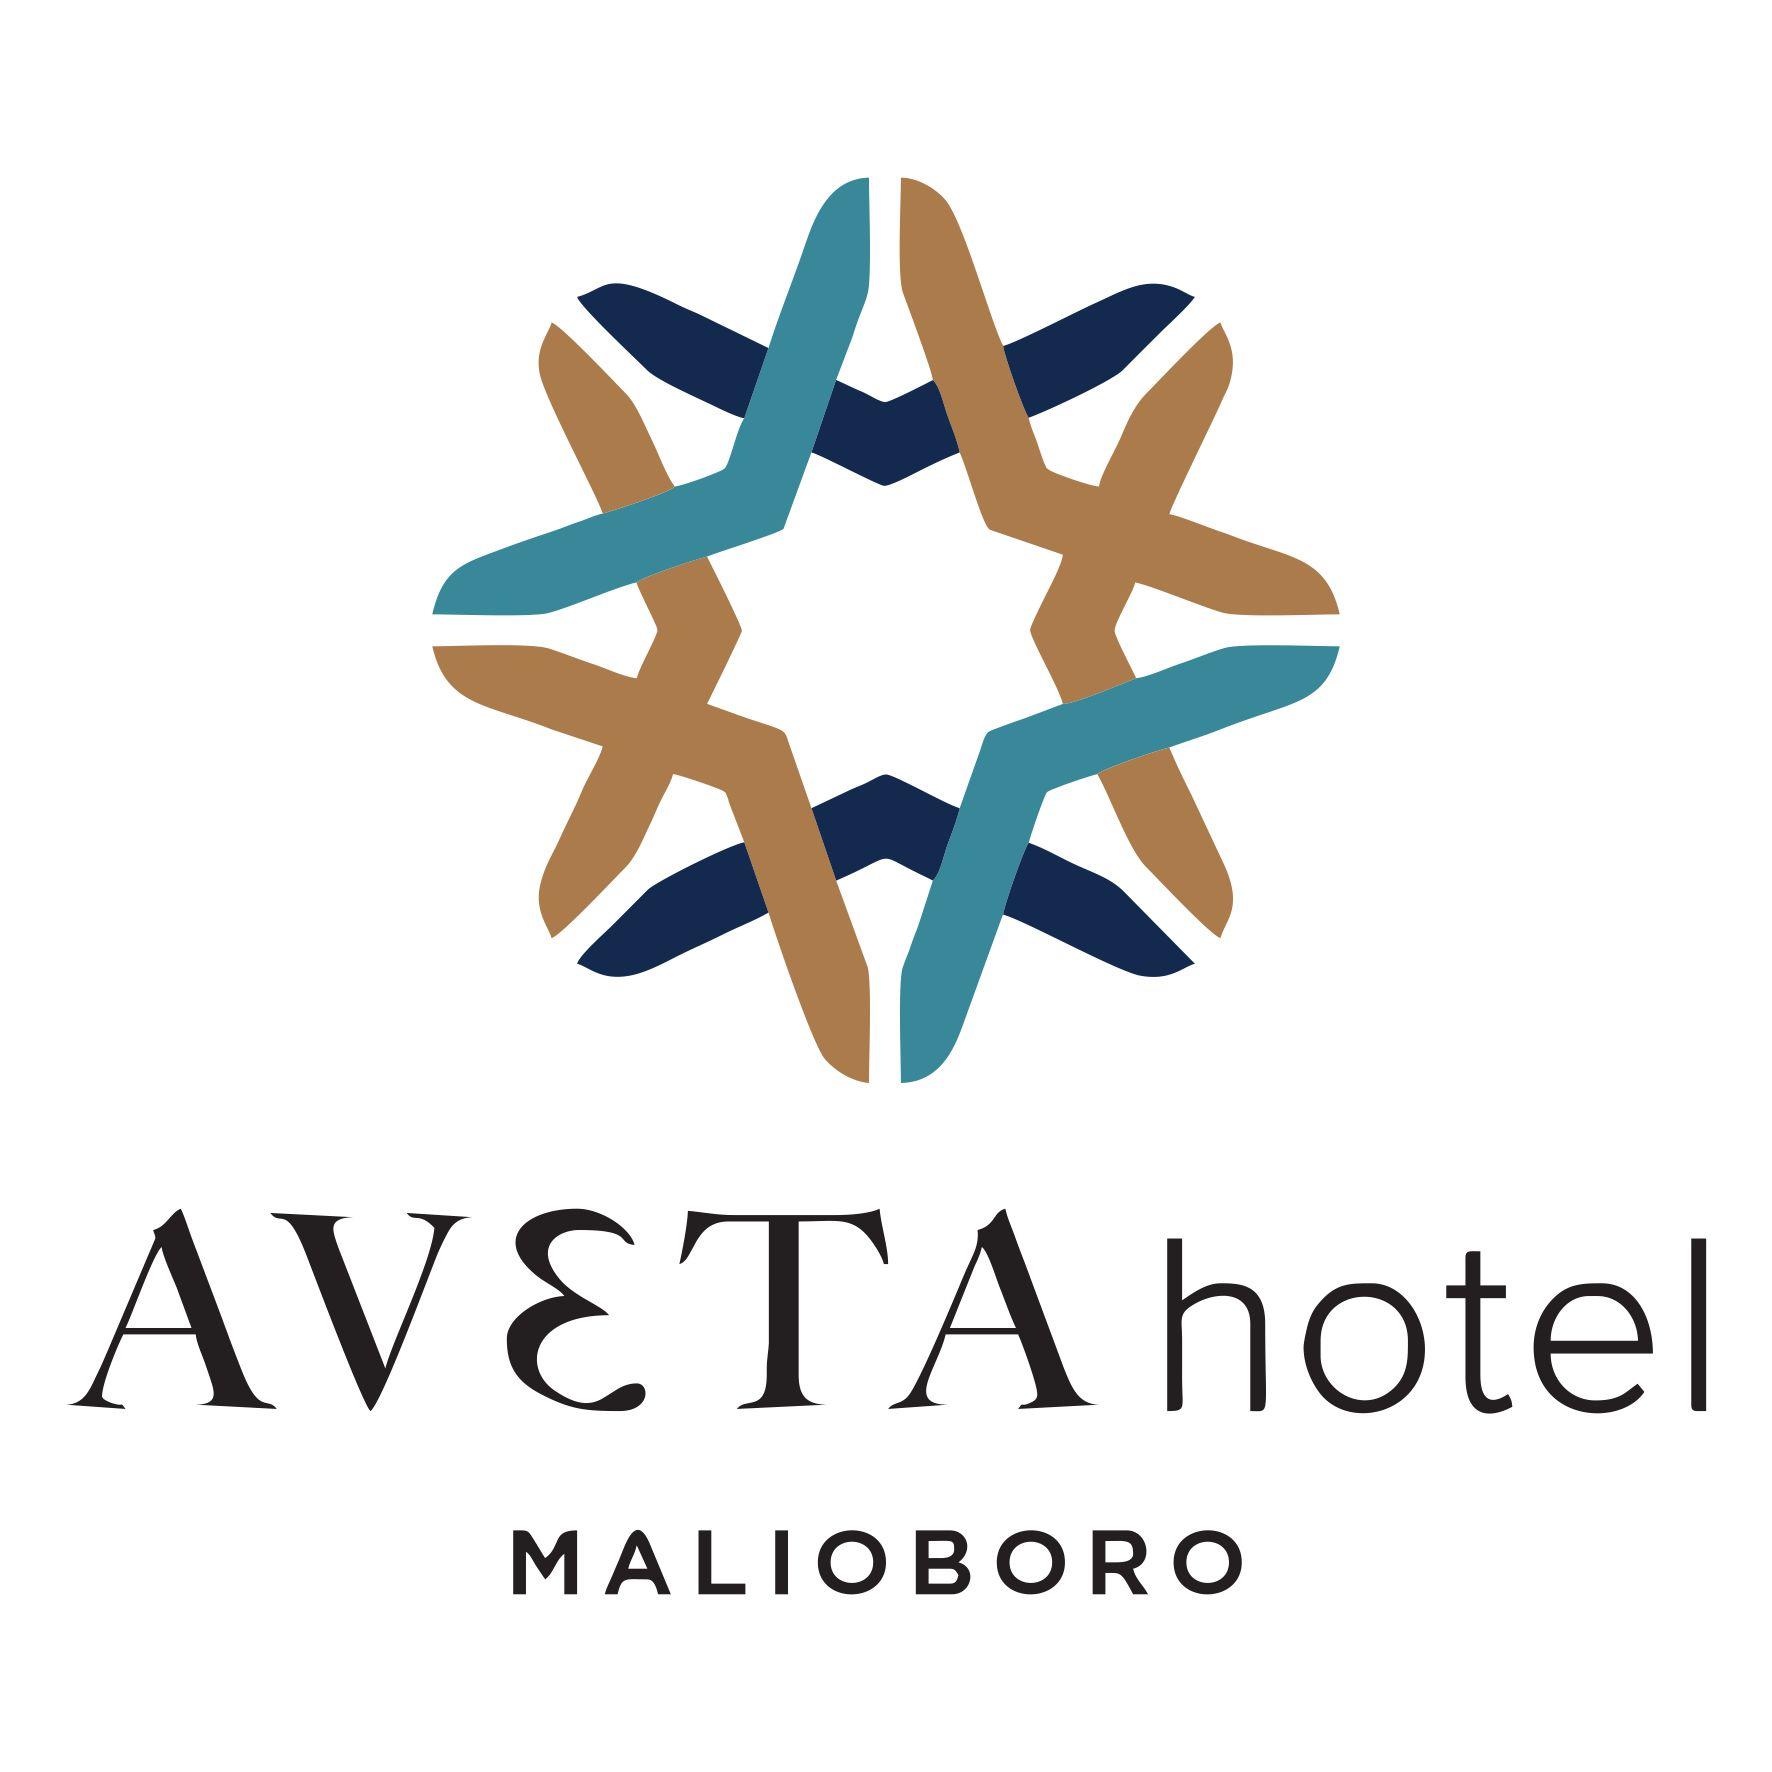 Marcom Aveta